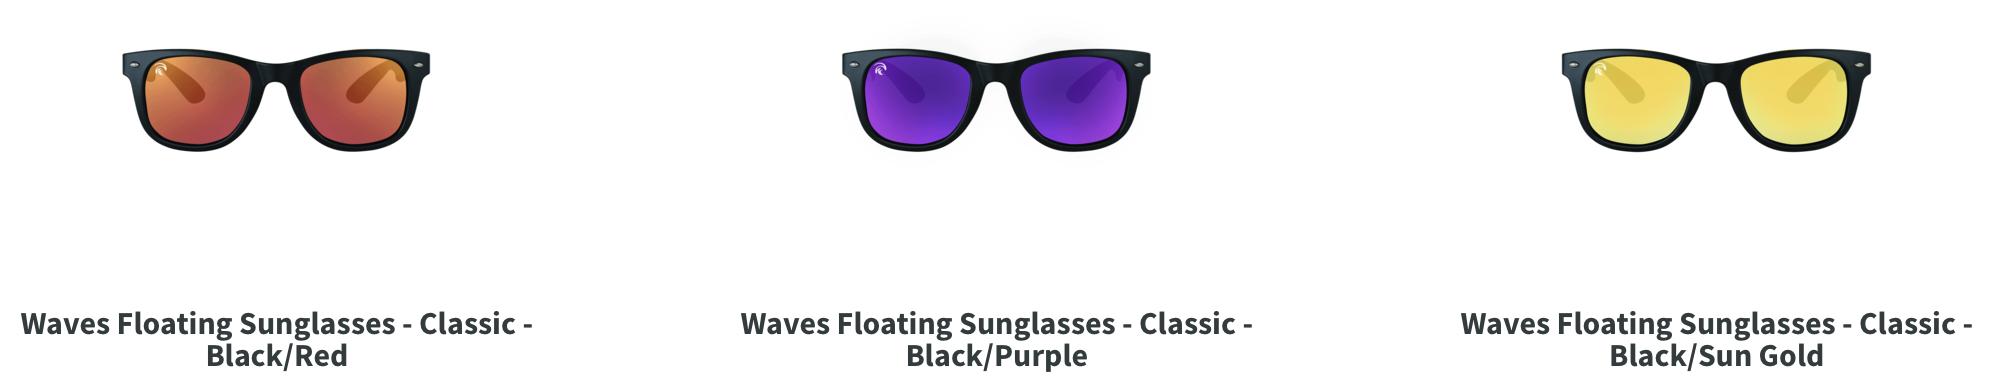 Waves Gear Sunglasses